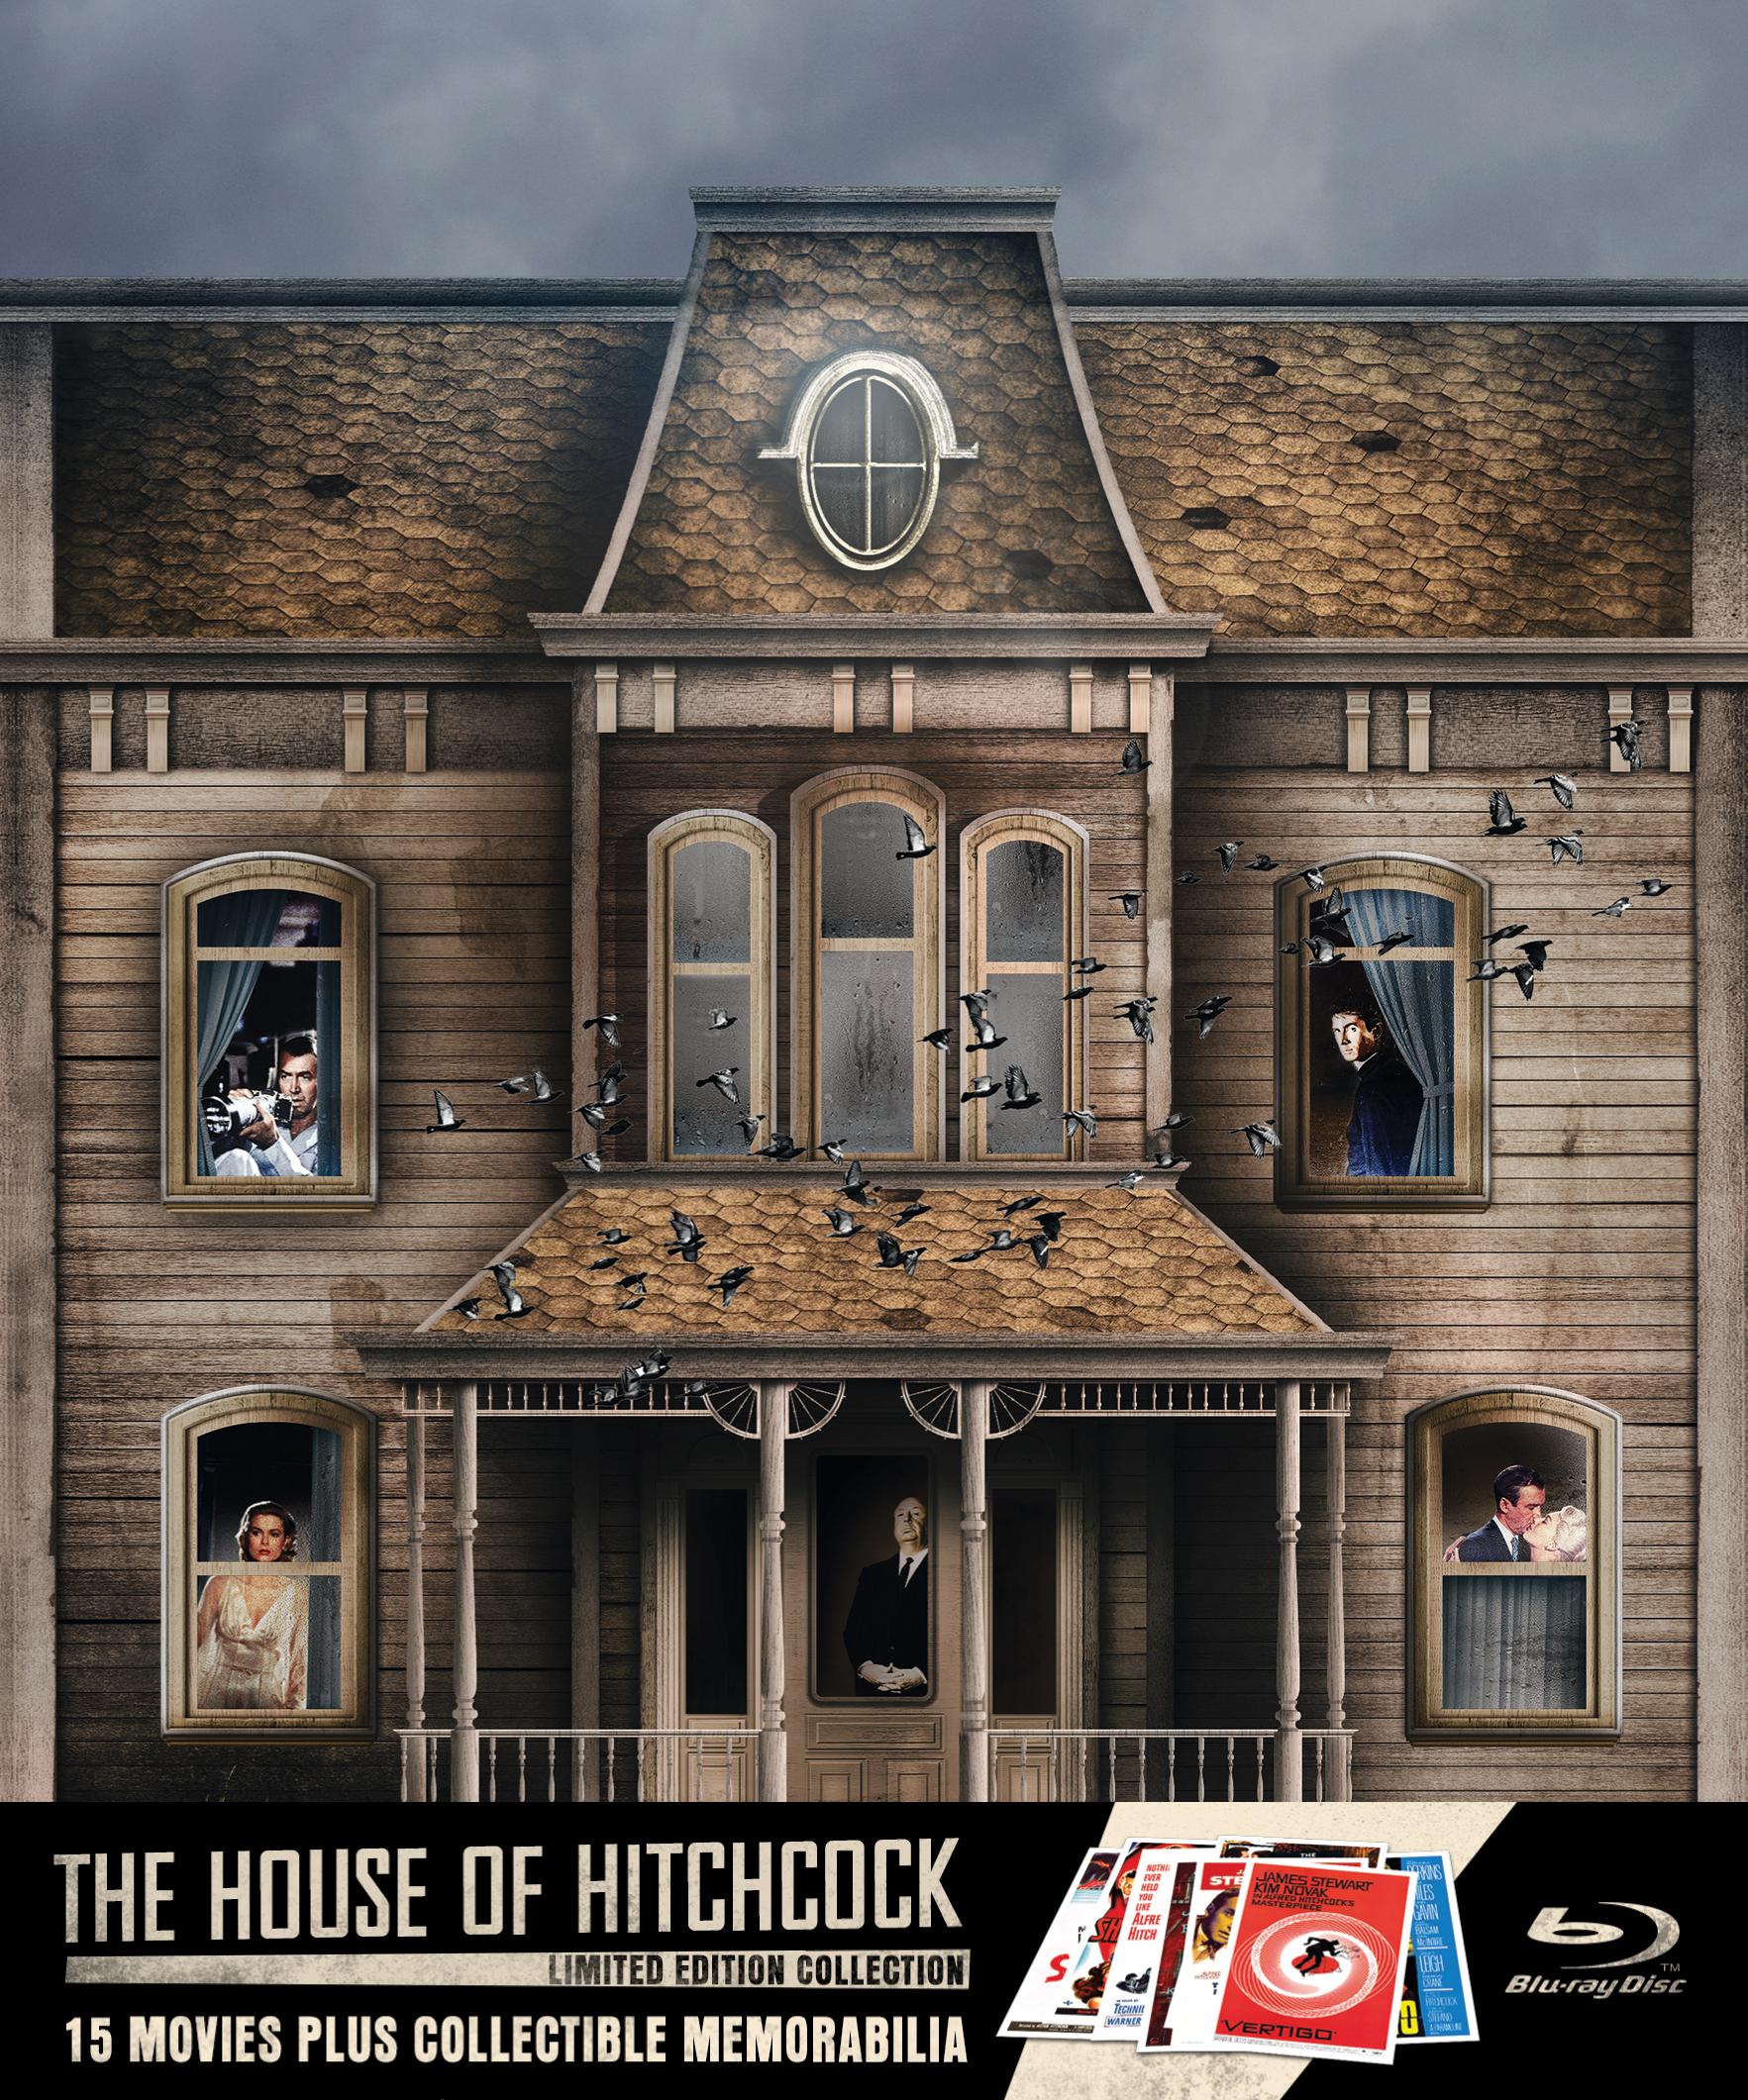 The House of Hitchcock US Blu-ray box set